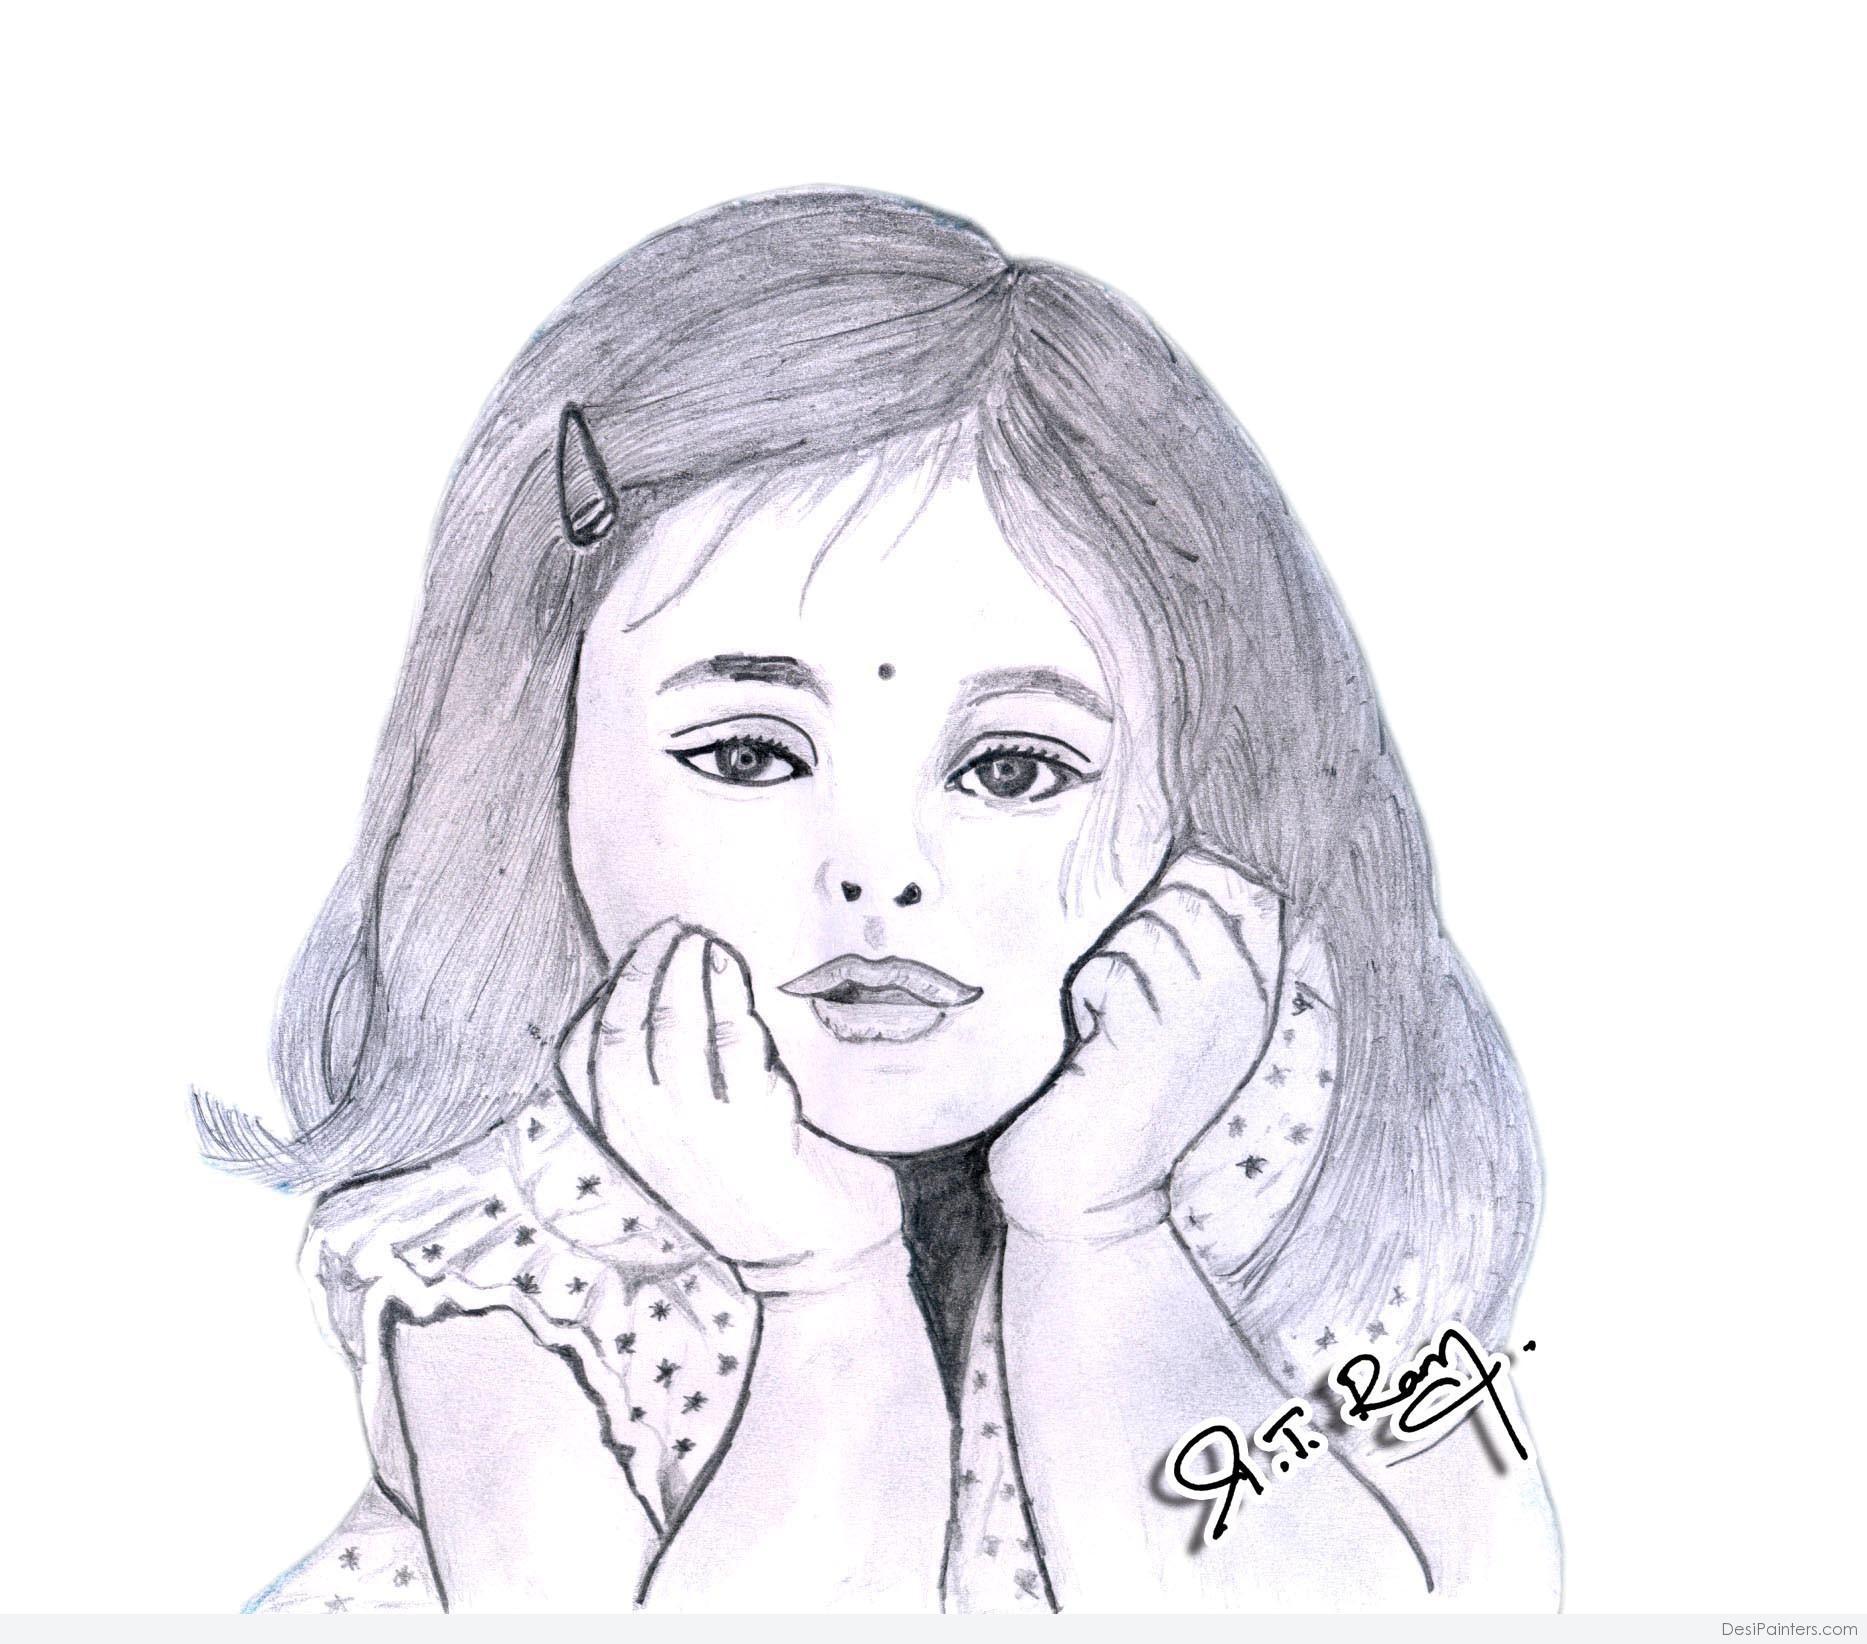 1867x1644 Cute Girls And Boys Pencil Drawings Paintingsp.t.muthuramalingam